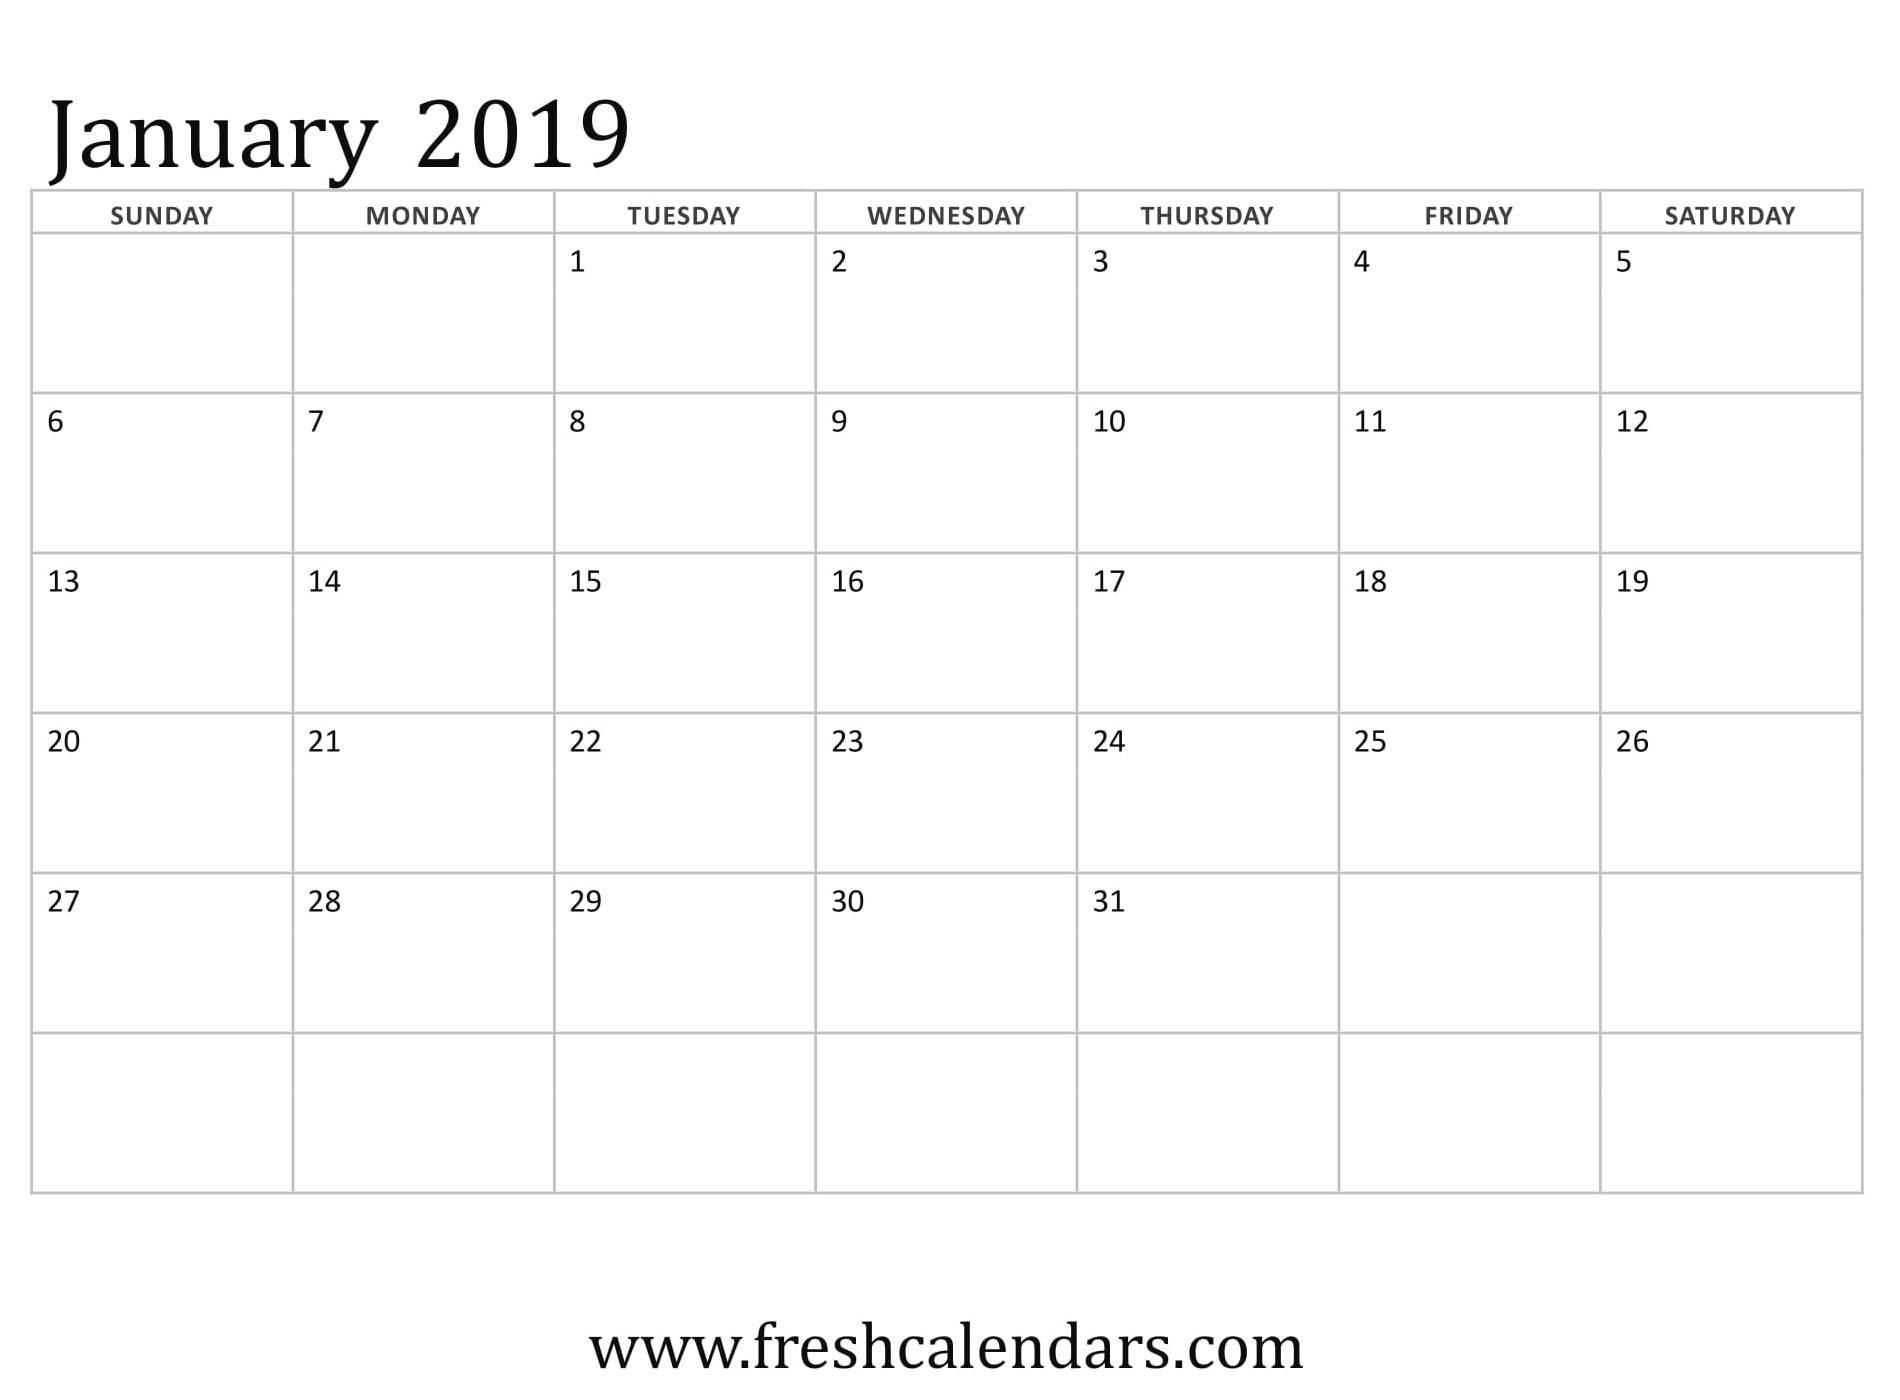 January 2019 Calendar Printable - Fresh Calendars throughout 2020 Julian Calendar Printable Pdf